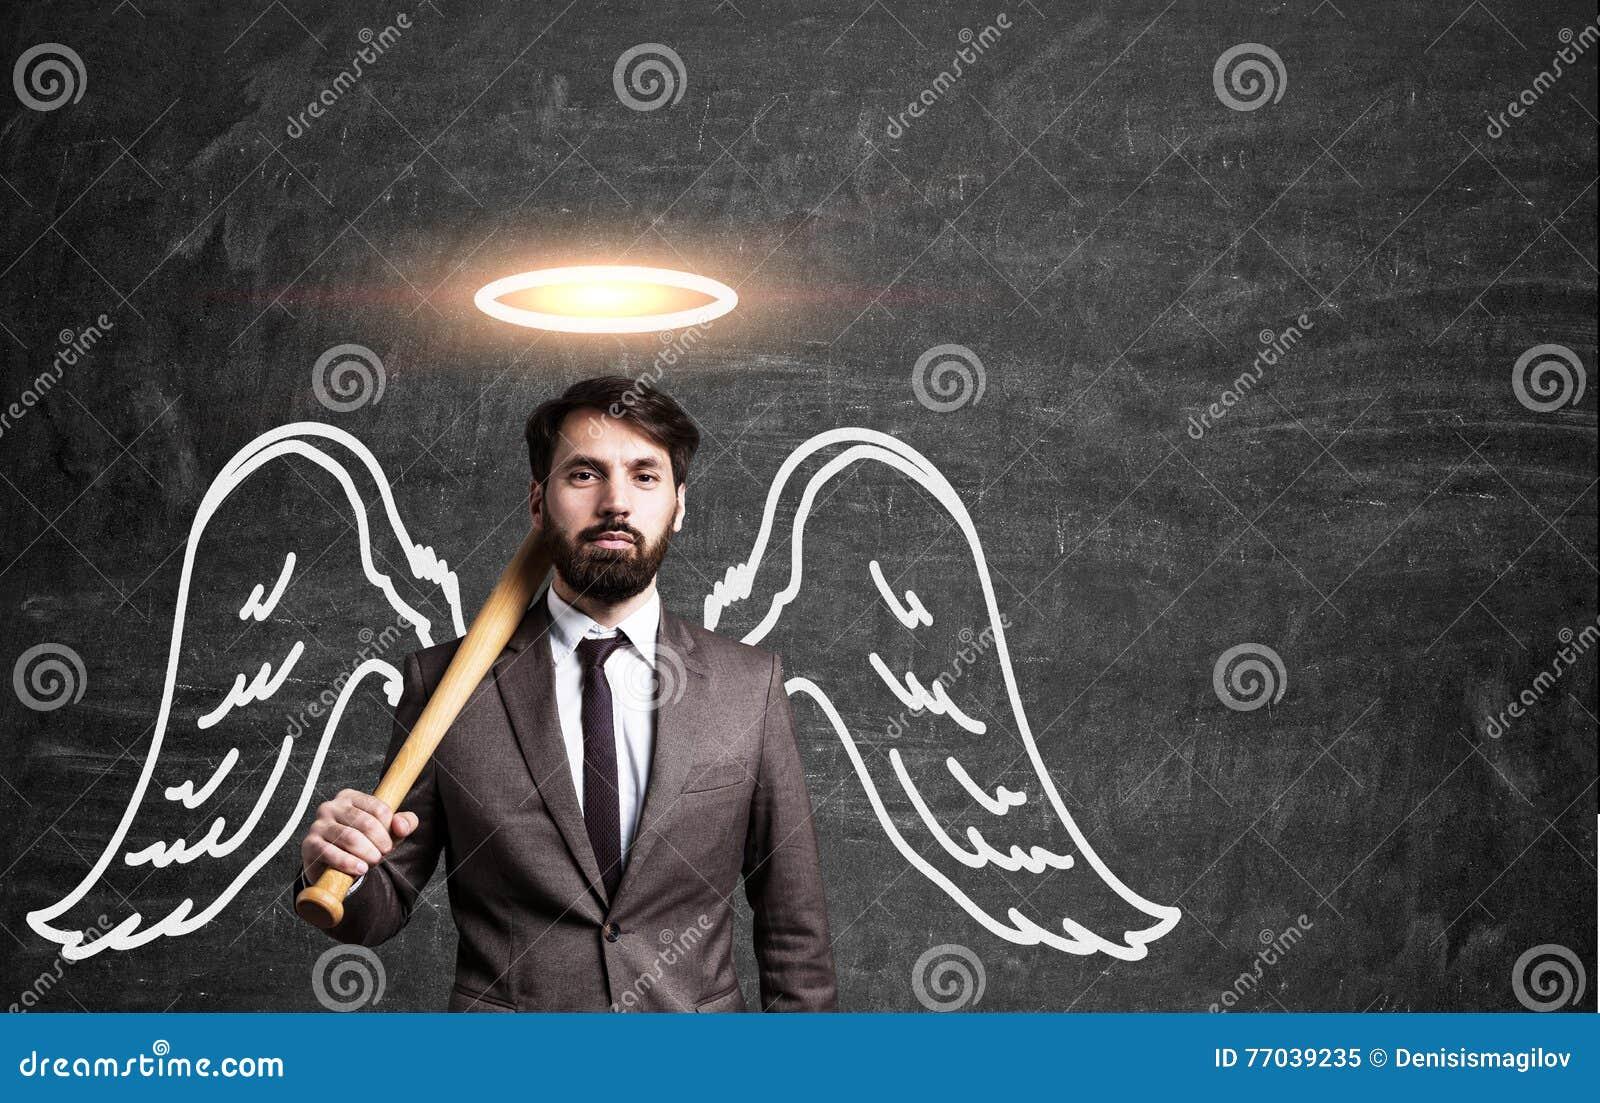 Image D Ange Homme homme d'affaires d'ange image stock. image du vide, tombé - 77039235